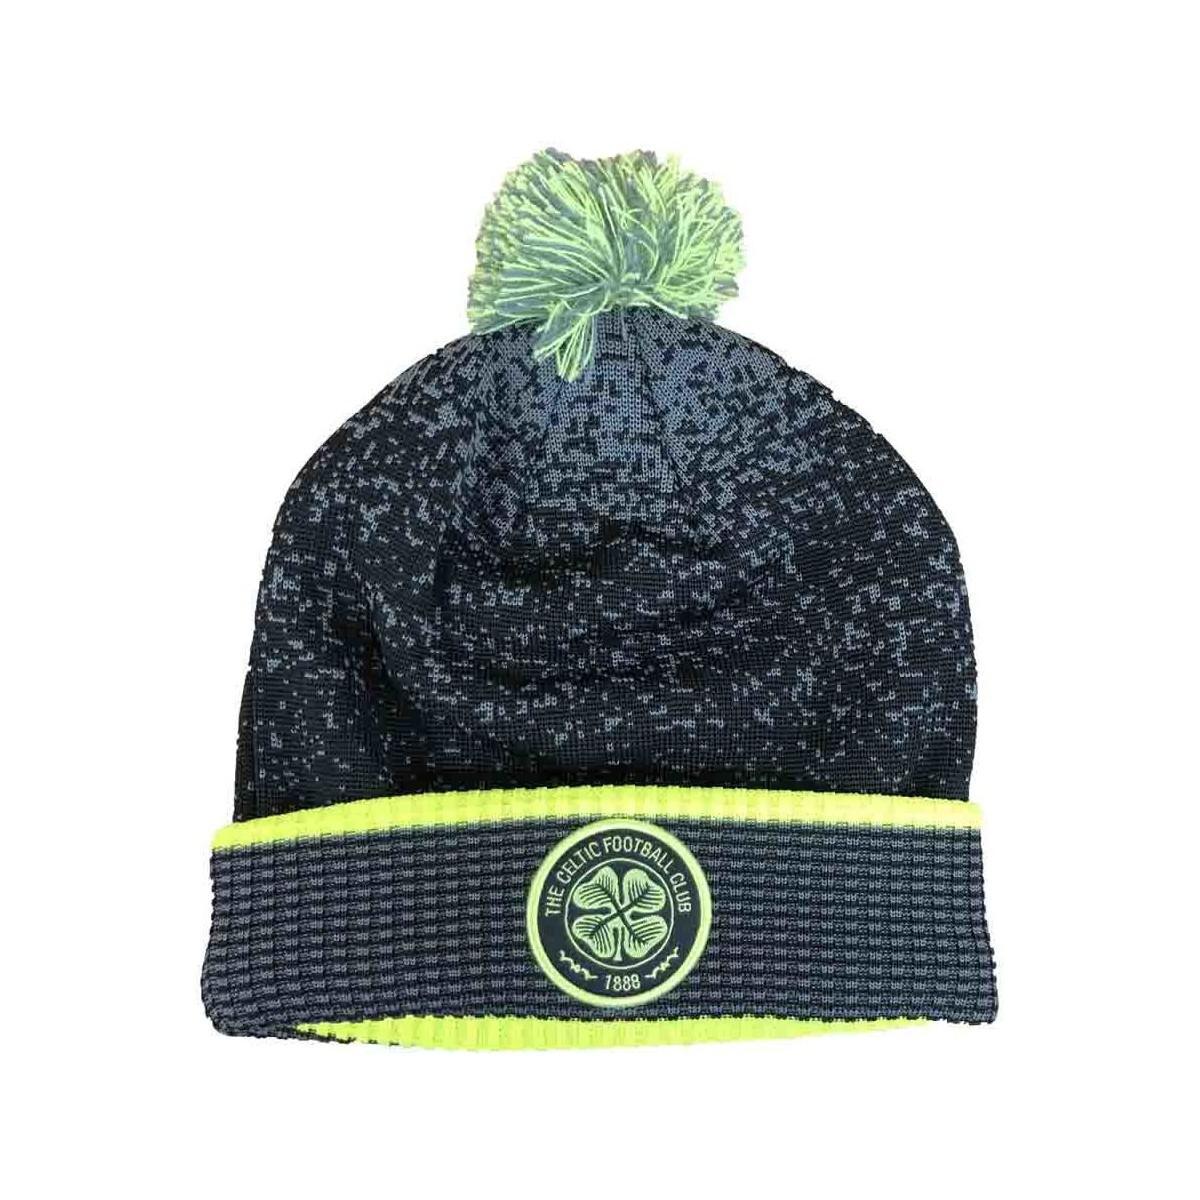 0b6ee507c13 New Balance 2018-2019 Celtic Woolie Hat Men s Beanie In Black in ...